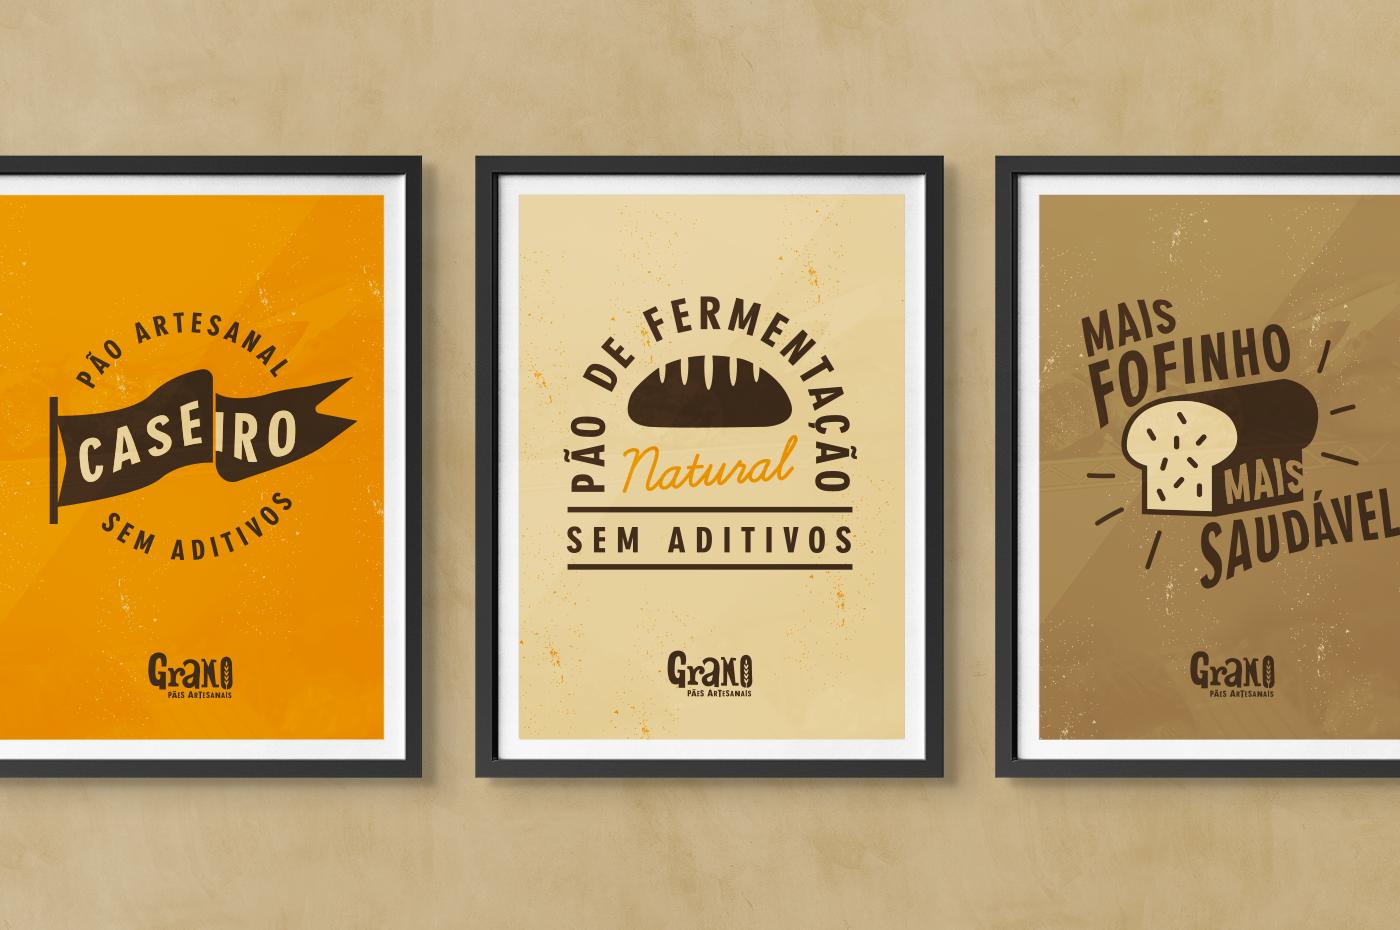 Grano bakery bread artesanal craft logo lettering artisan